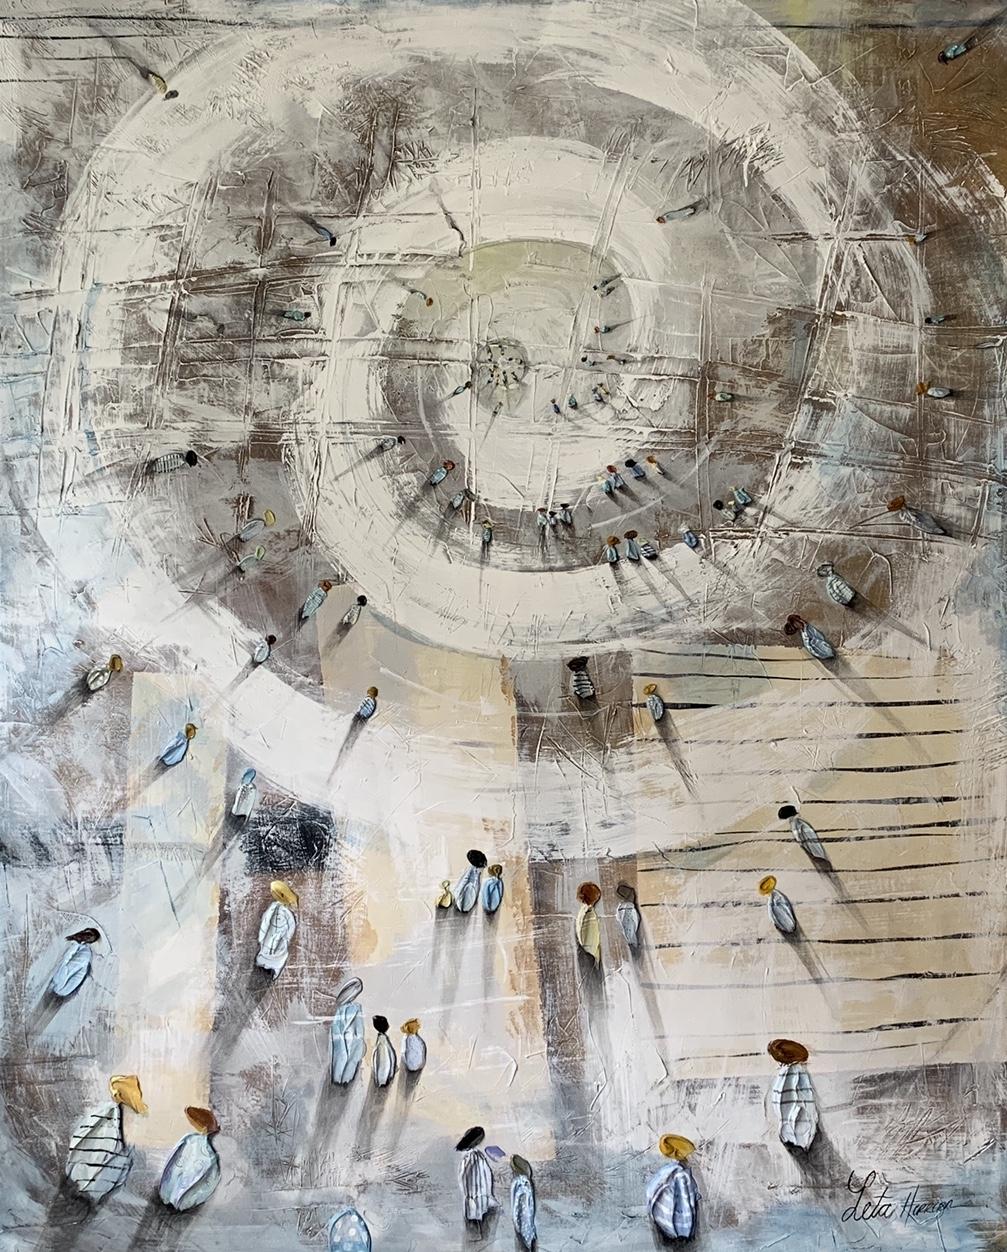 Infinite Dream, 2019, Mixed Media, 48 x 48 inches, $2,800